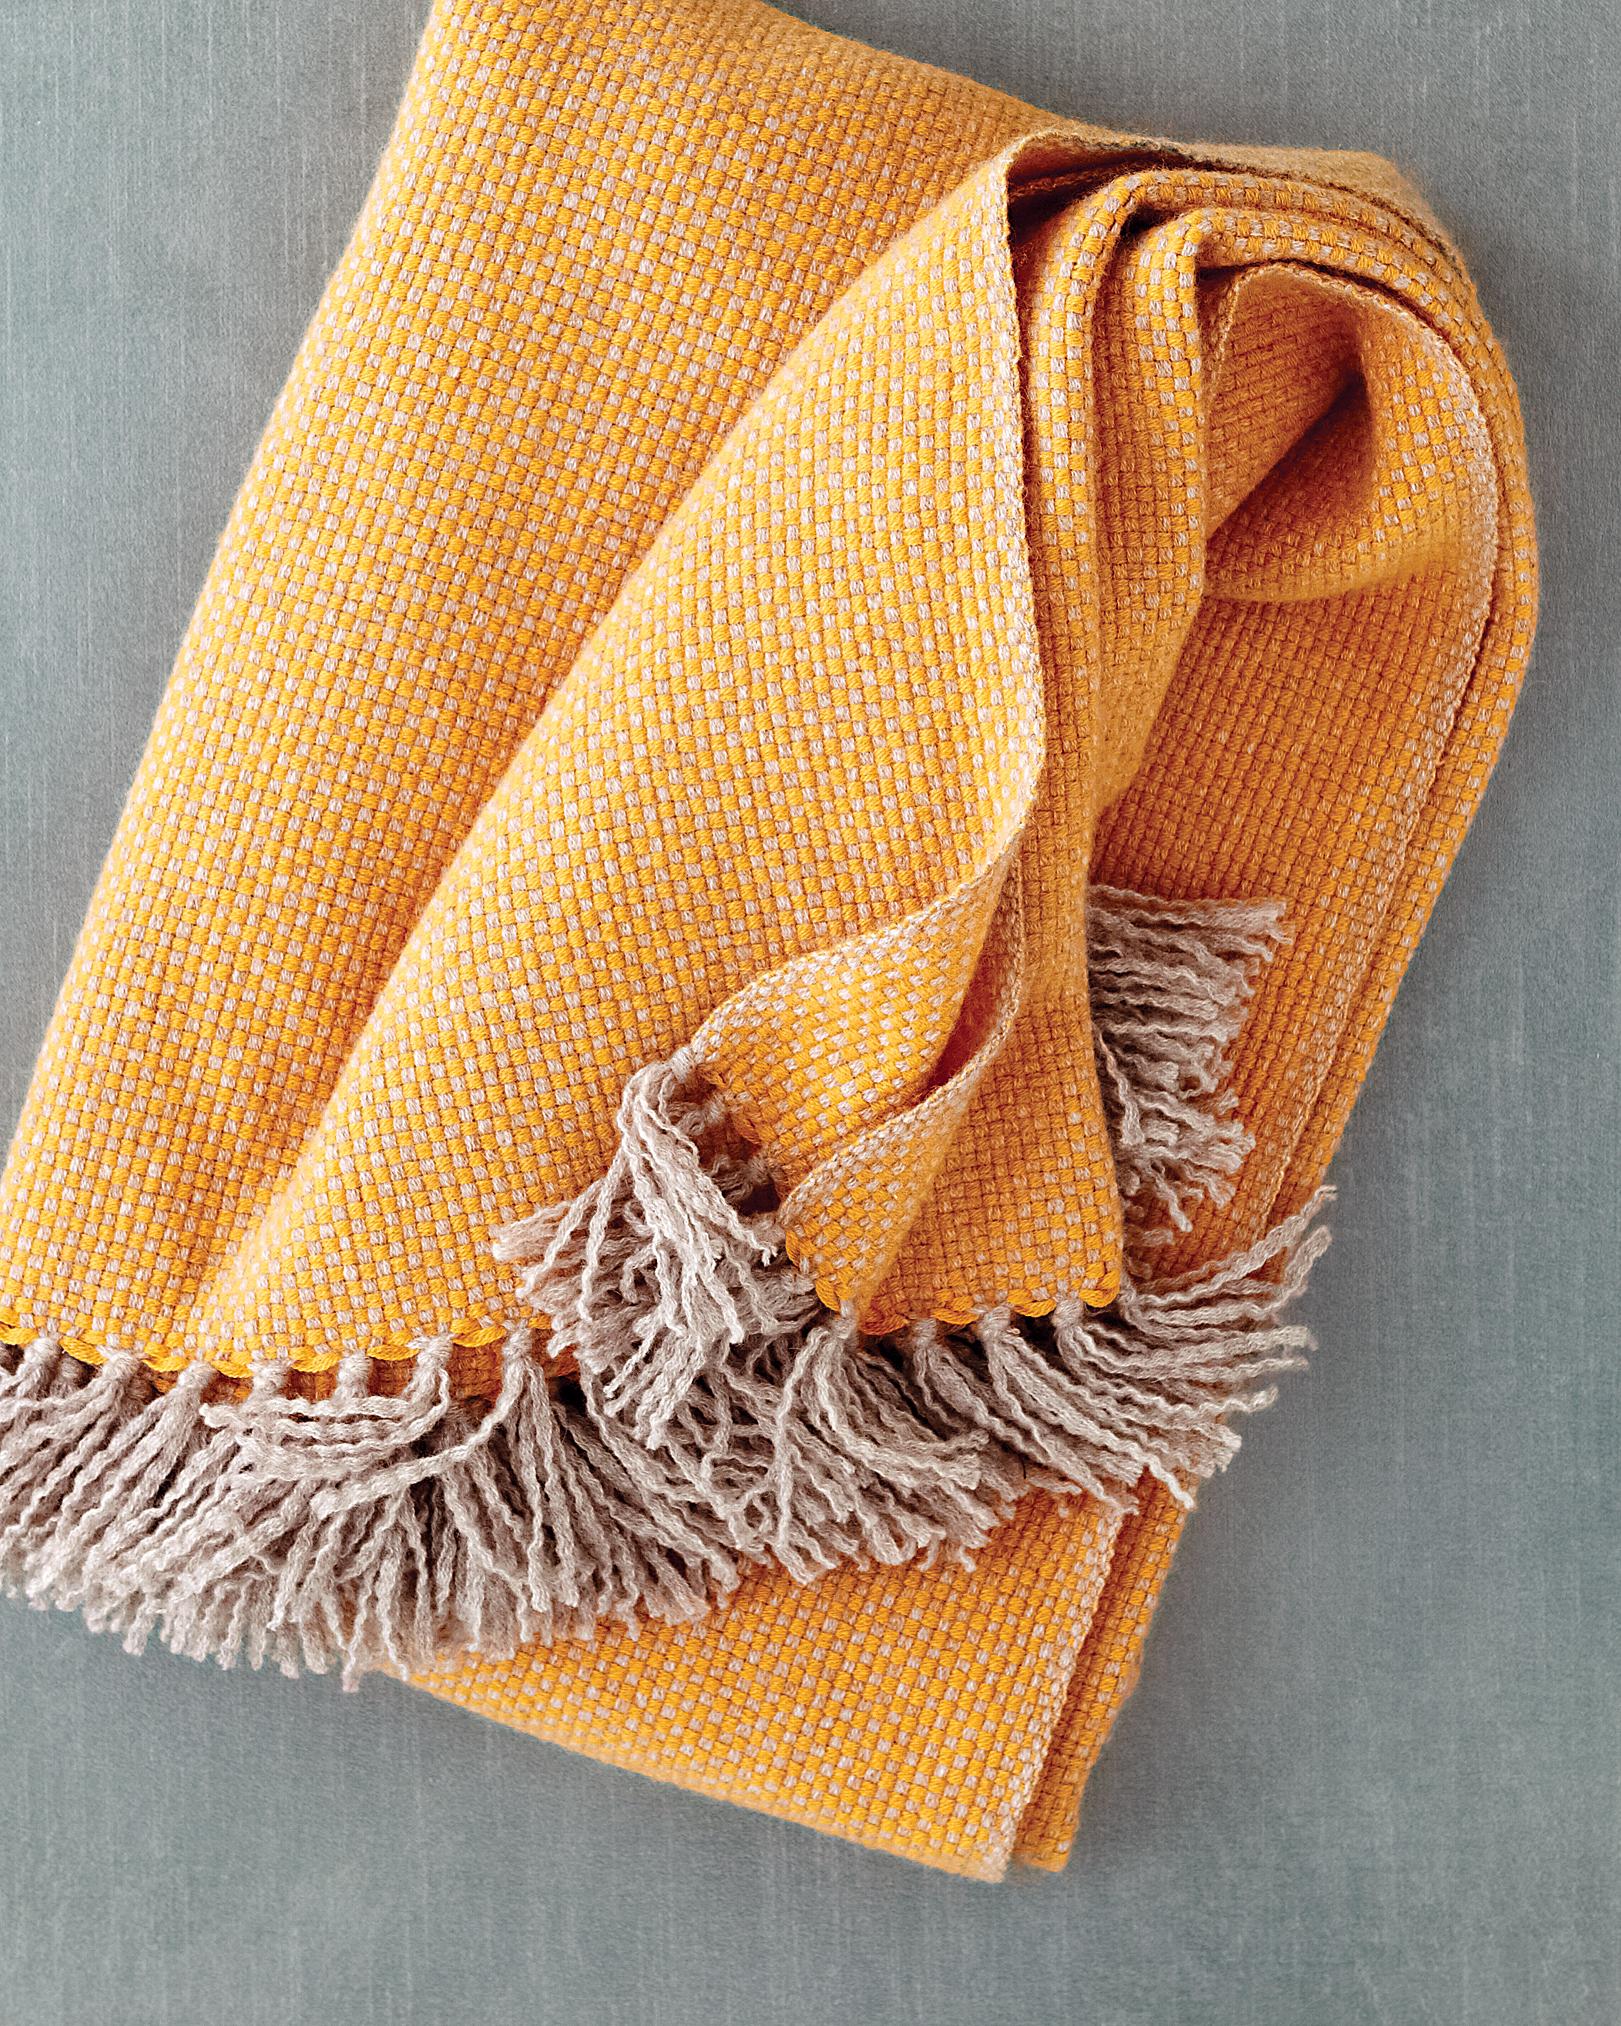 cashmere-throw-0811mwd107434.jpg